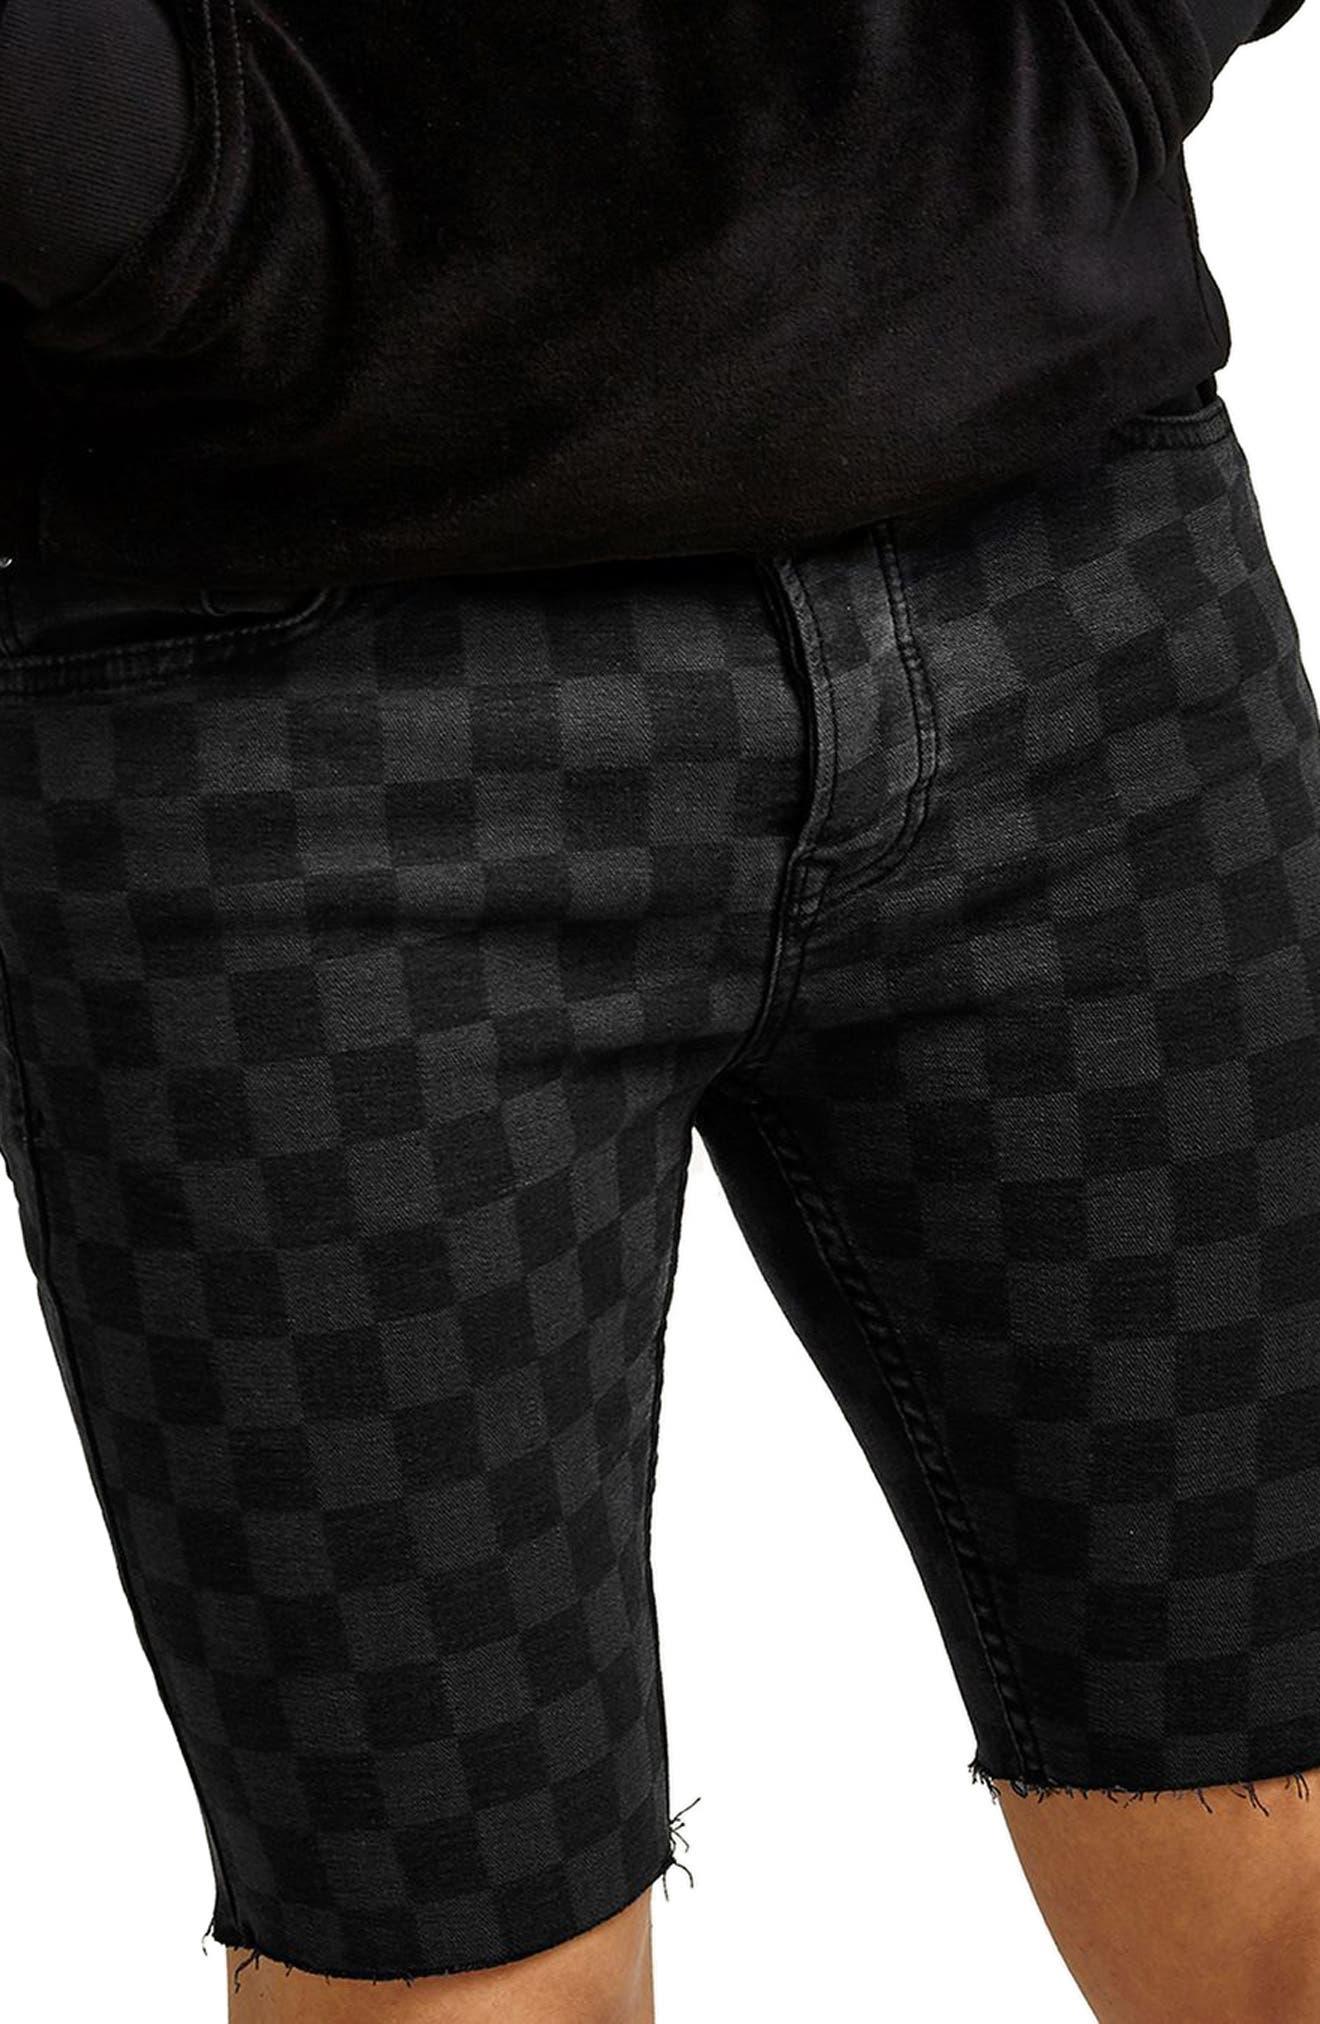 Stretch Skinny Fit Check Denim Shorts,                         Main,                         color, Black